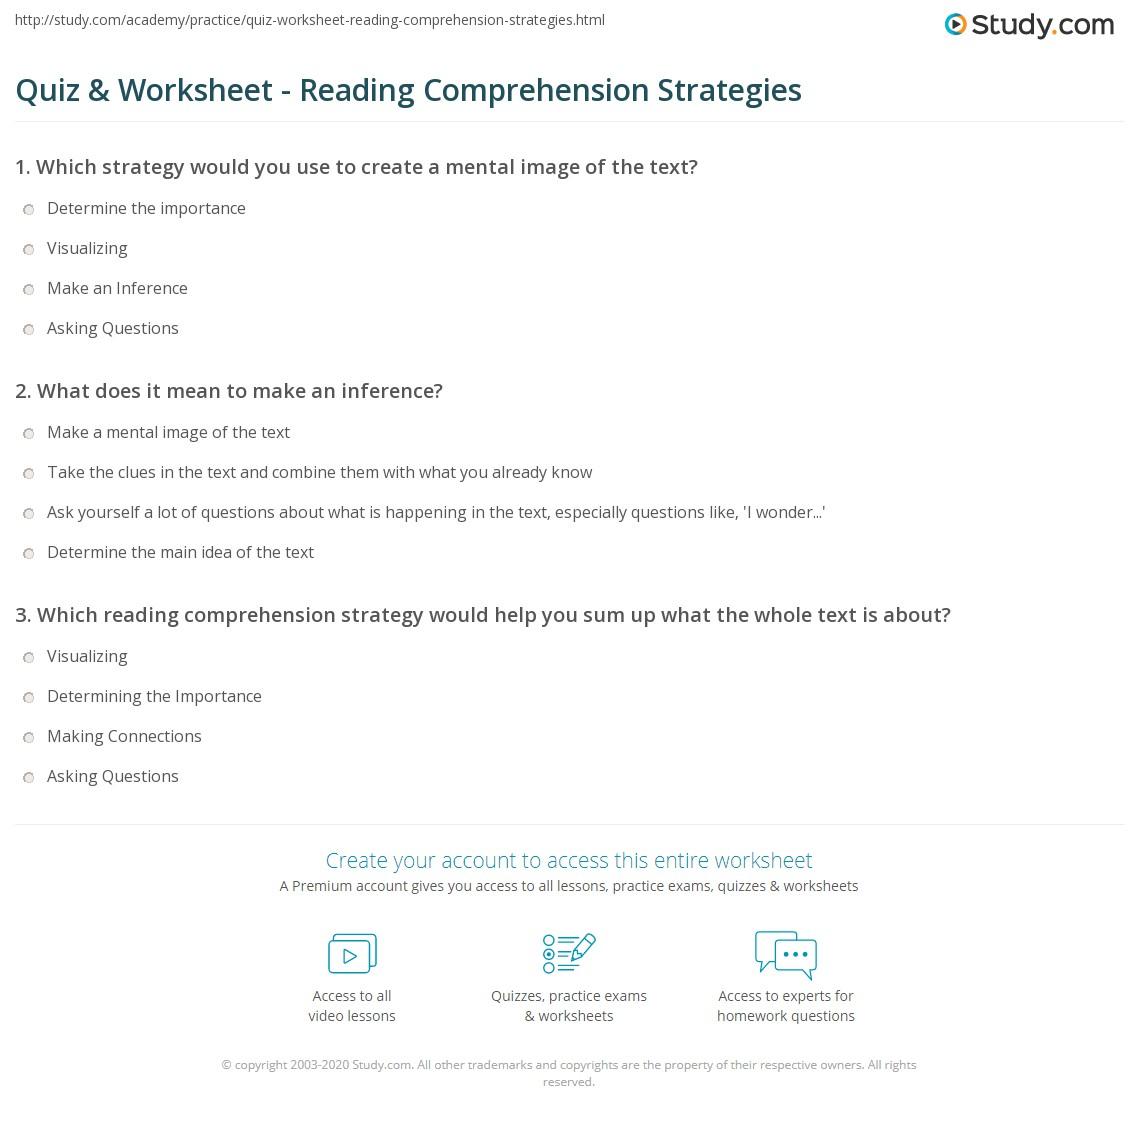 Quiz W Ksheet Re D G Prehensi Str Tegies Study